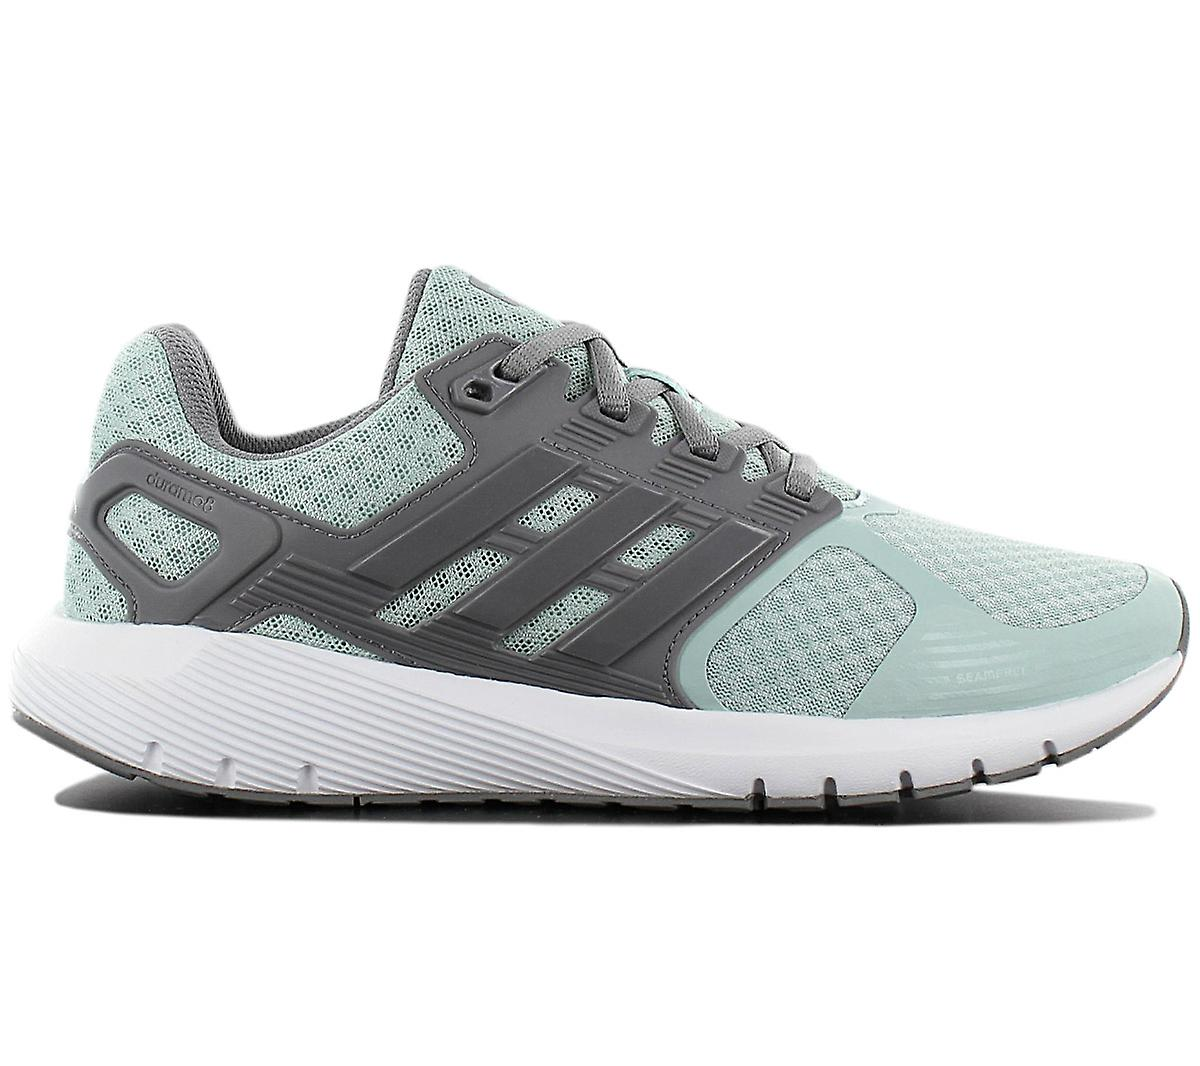 adidas Duramo 8W CP8754 Damen Schuhe Grün Sneakers Sportschuhe ZnY1s